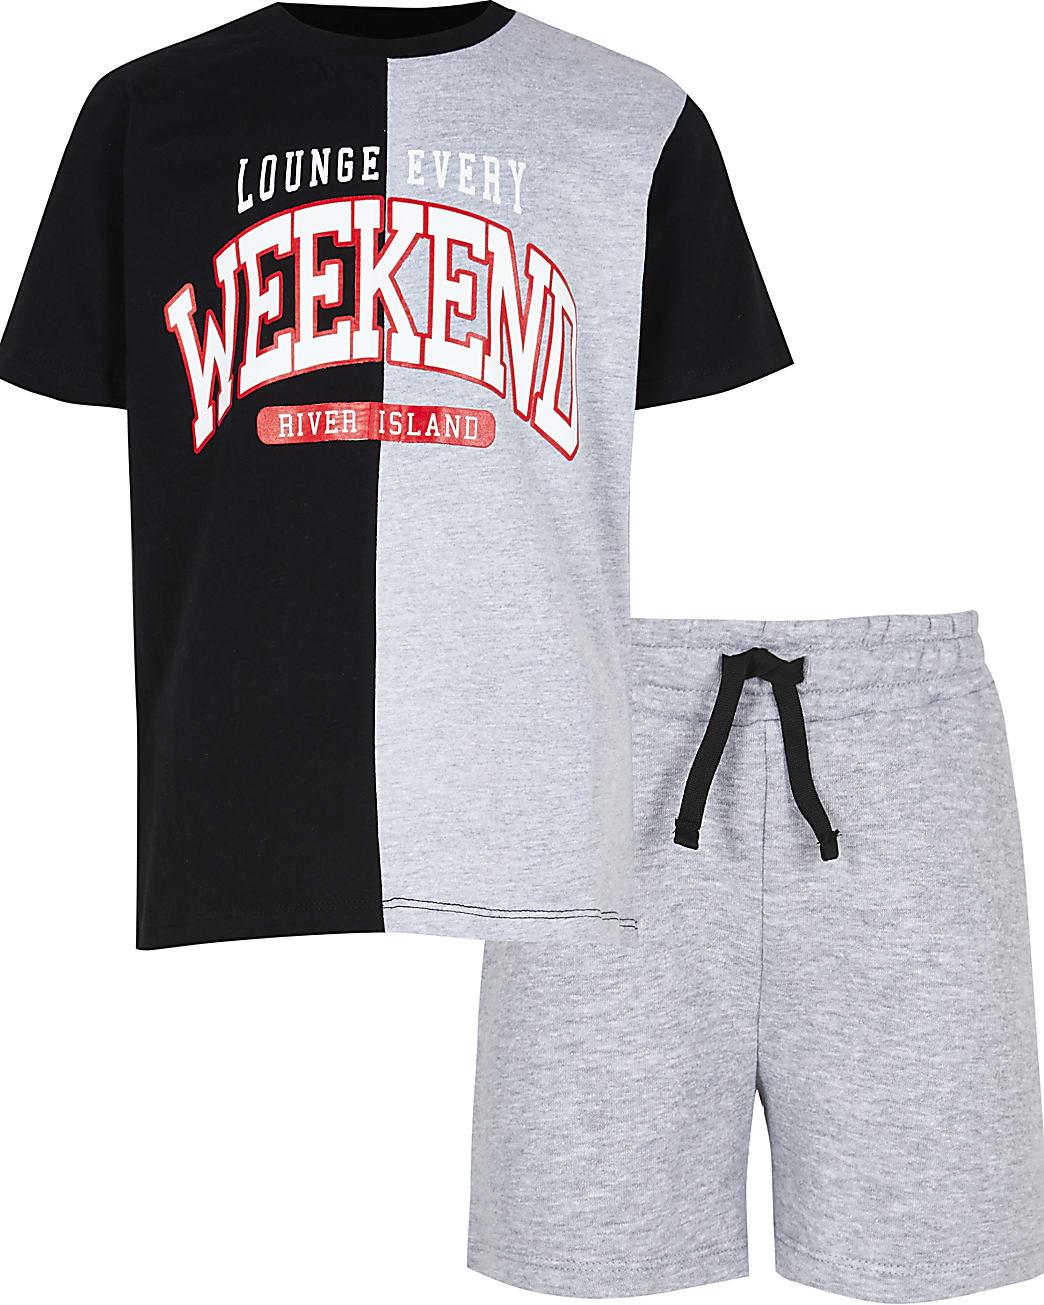 Boys grey 'Weekend' pyjama set